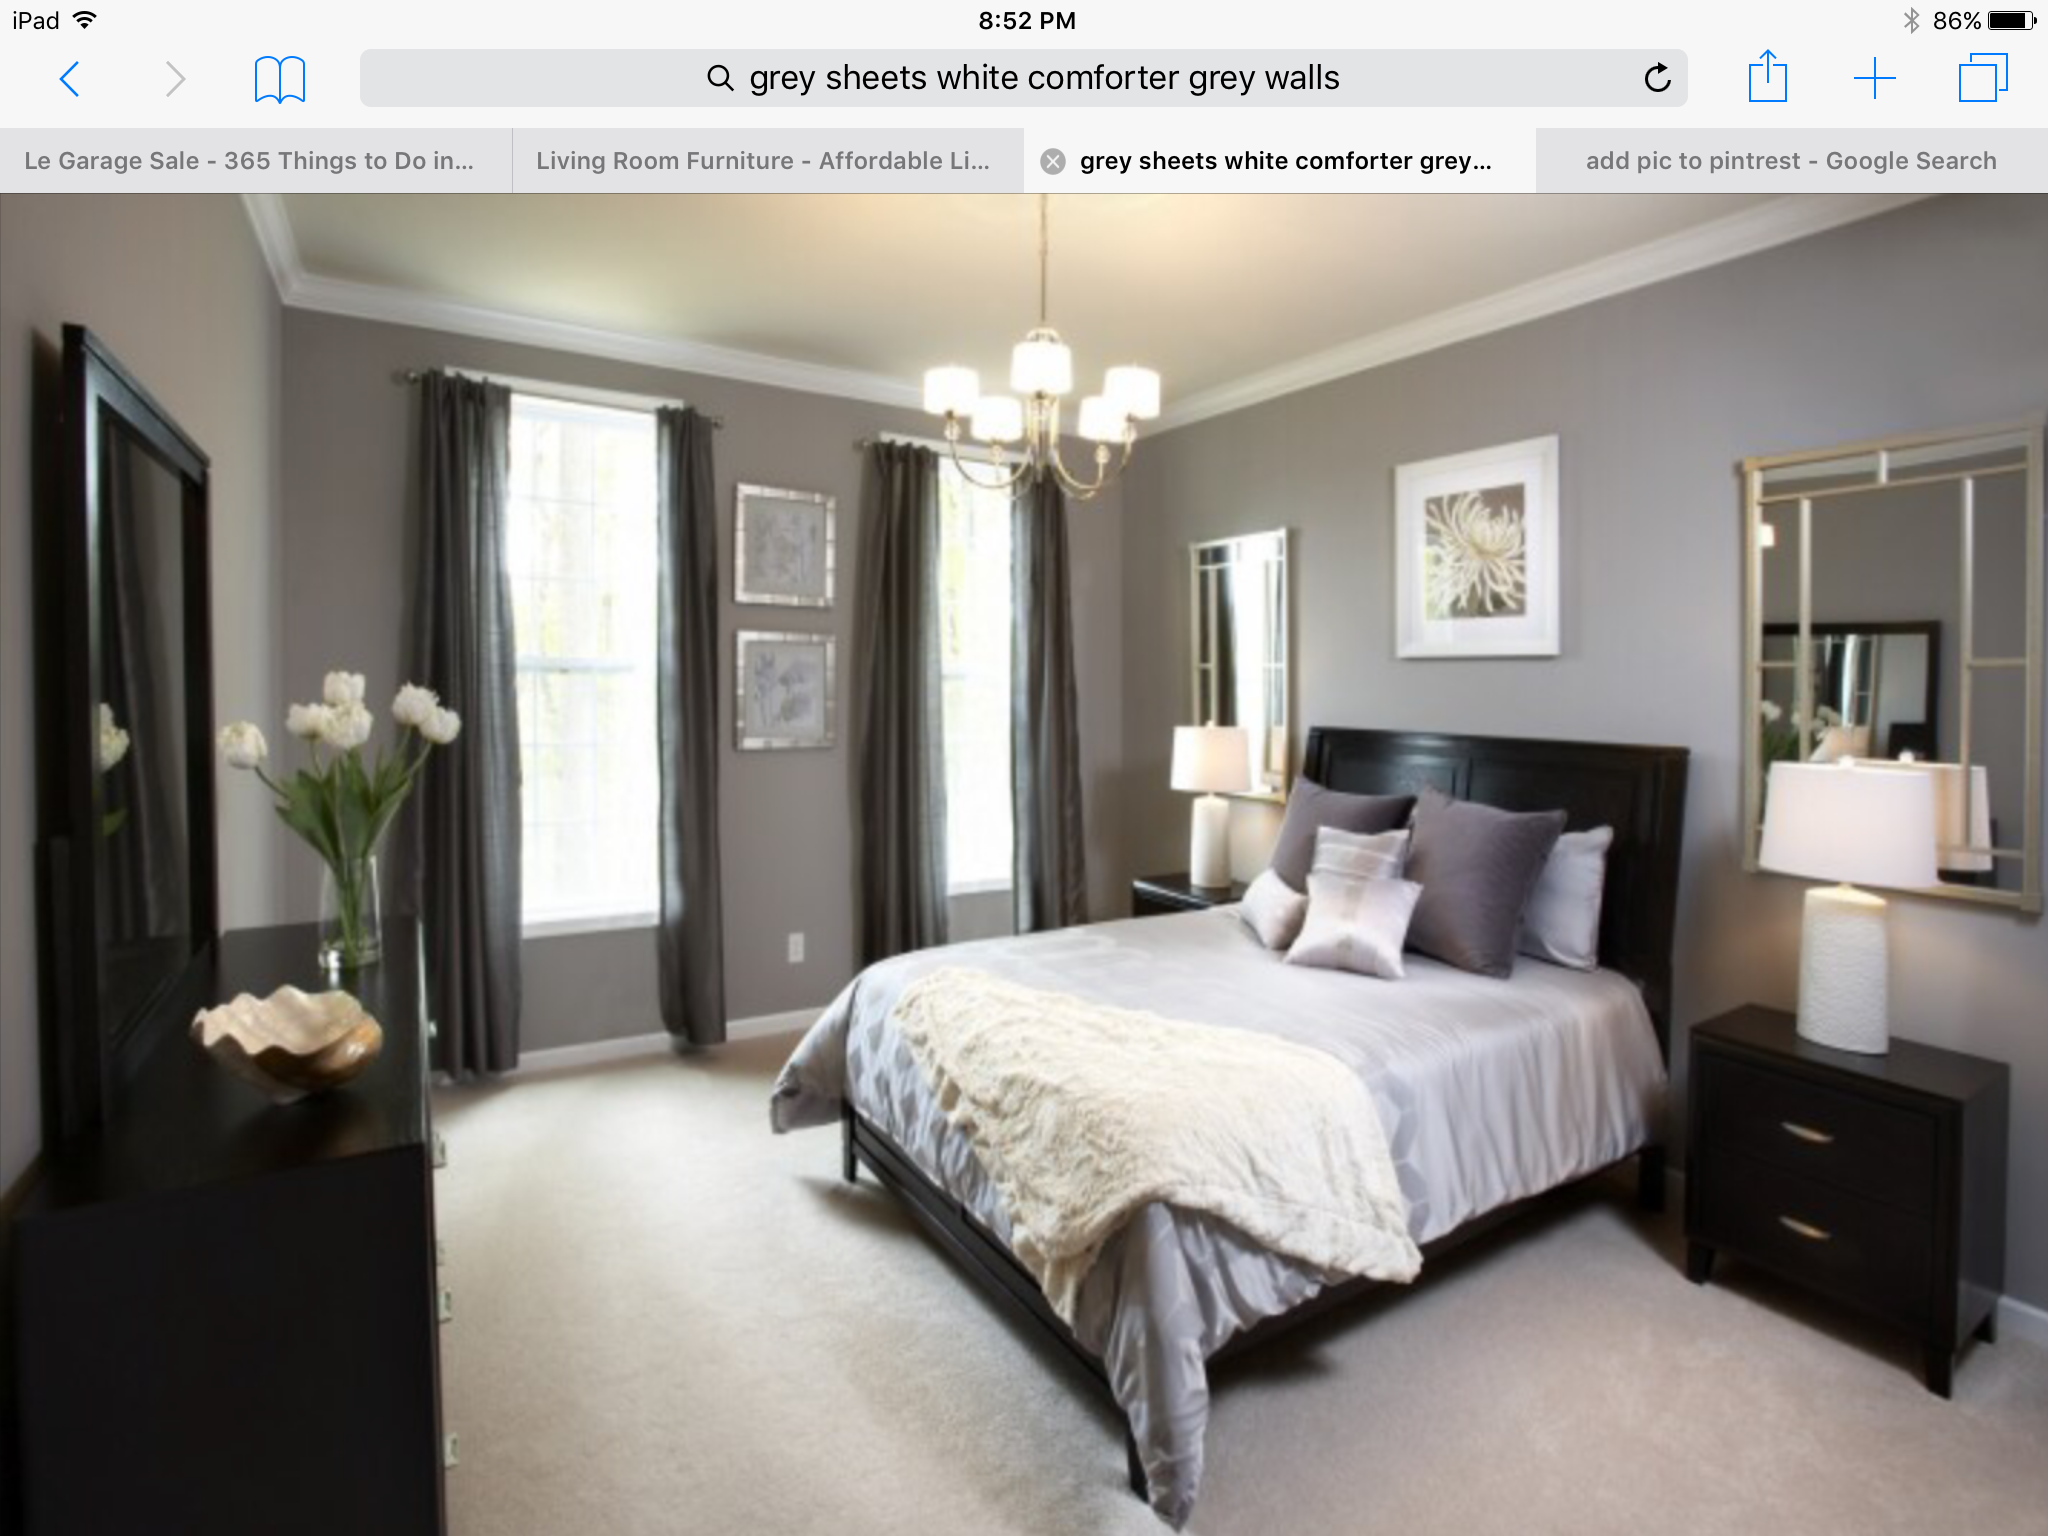 Black Curtains Bedroom Master Grey With Gray Walls Dark Furniture